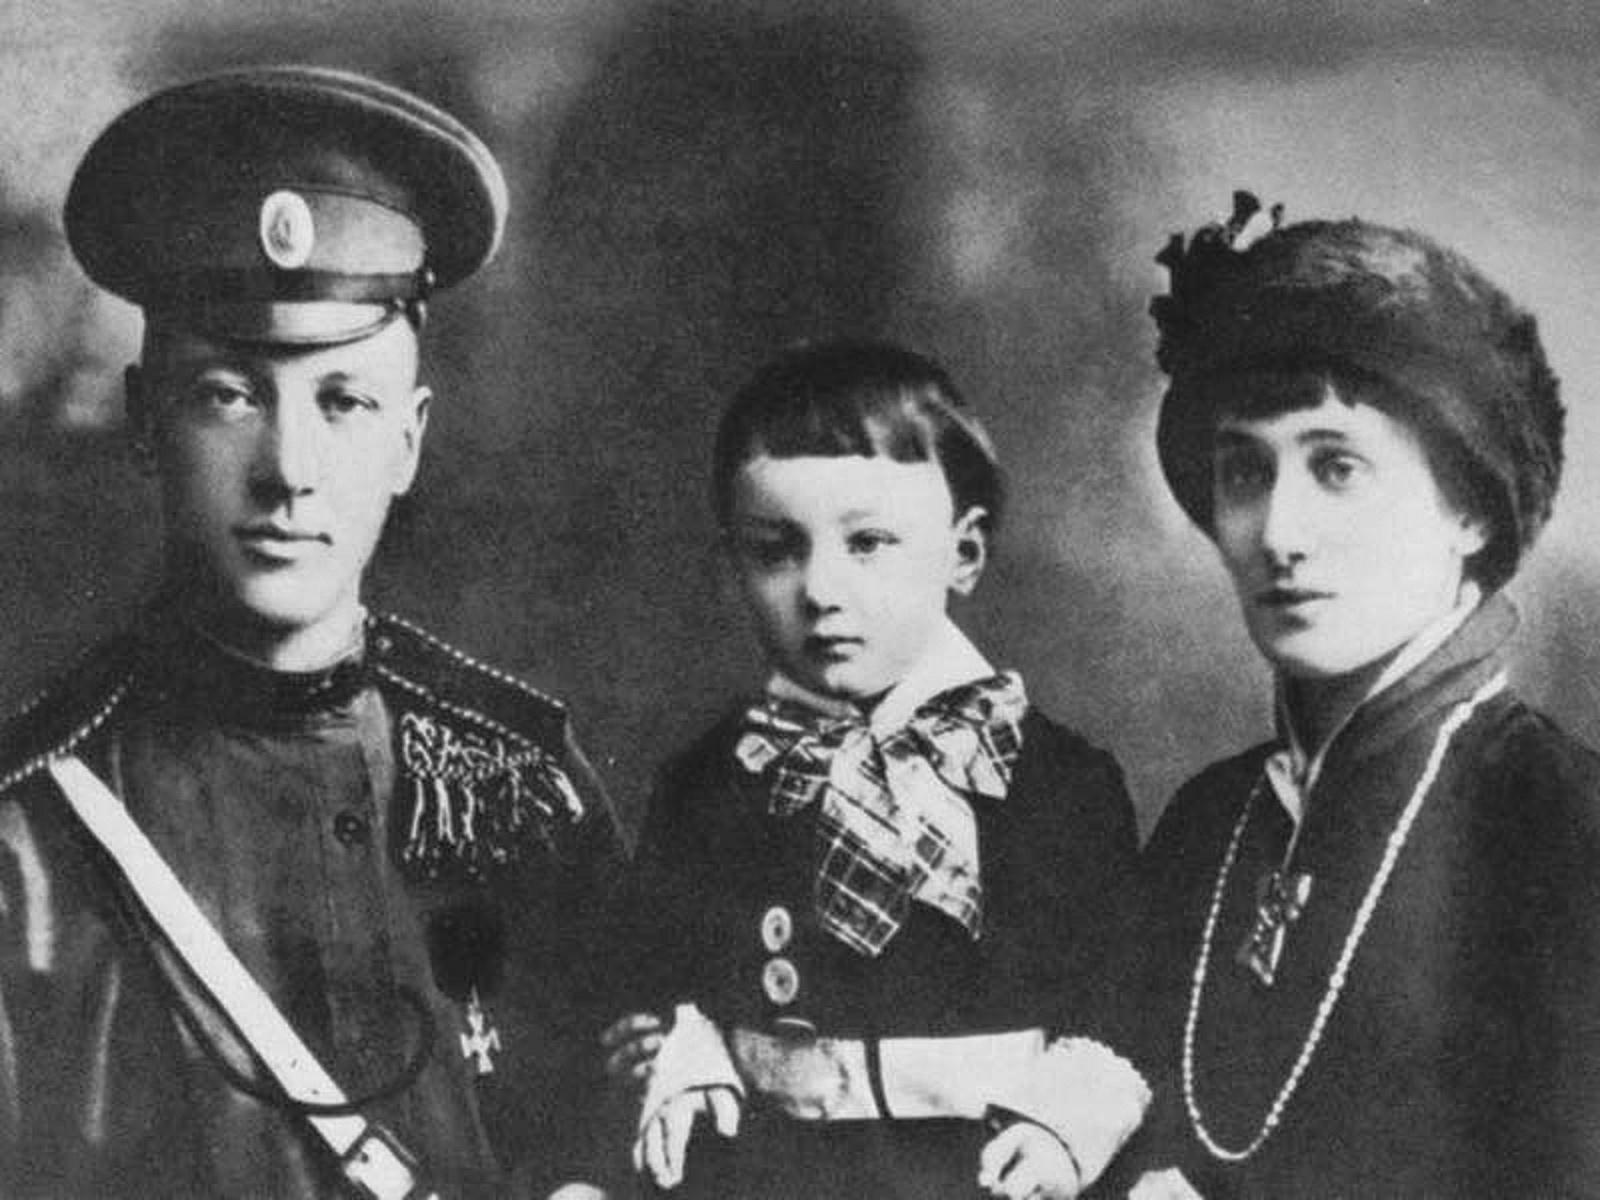 Lev Gumilev with his parents, Nikolai Gumilev and Anna Akhmatova, 1916